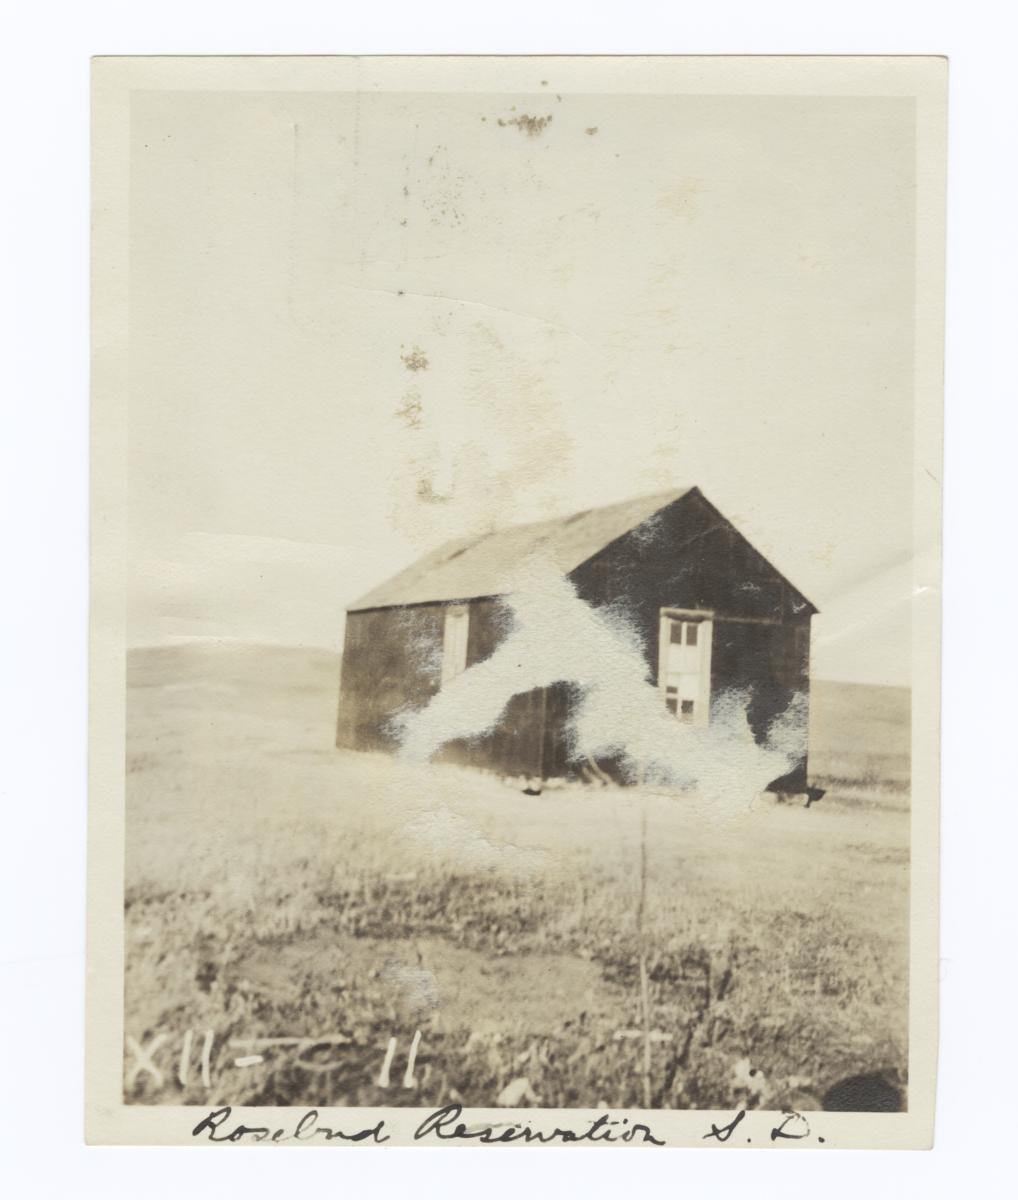 Congregational Church, Rosebud Reservation, South Dakota